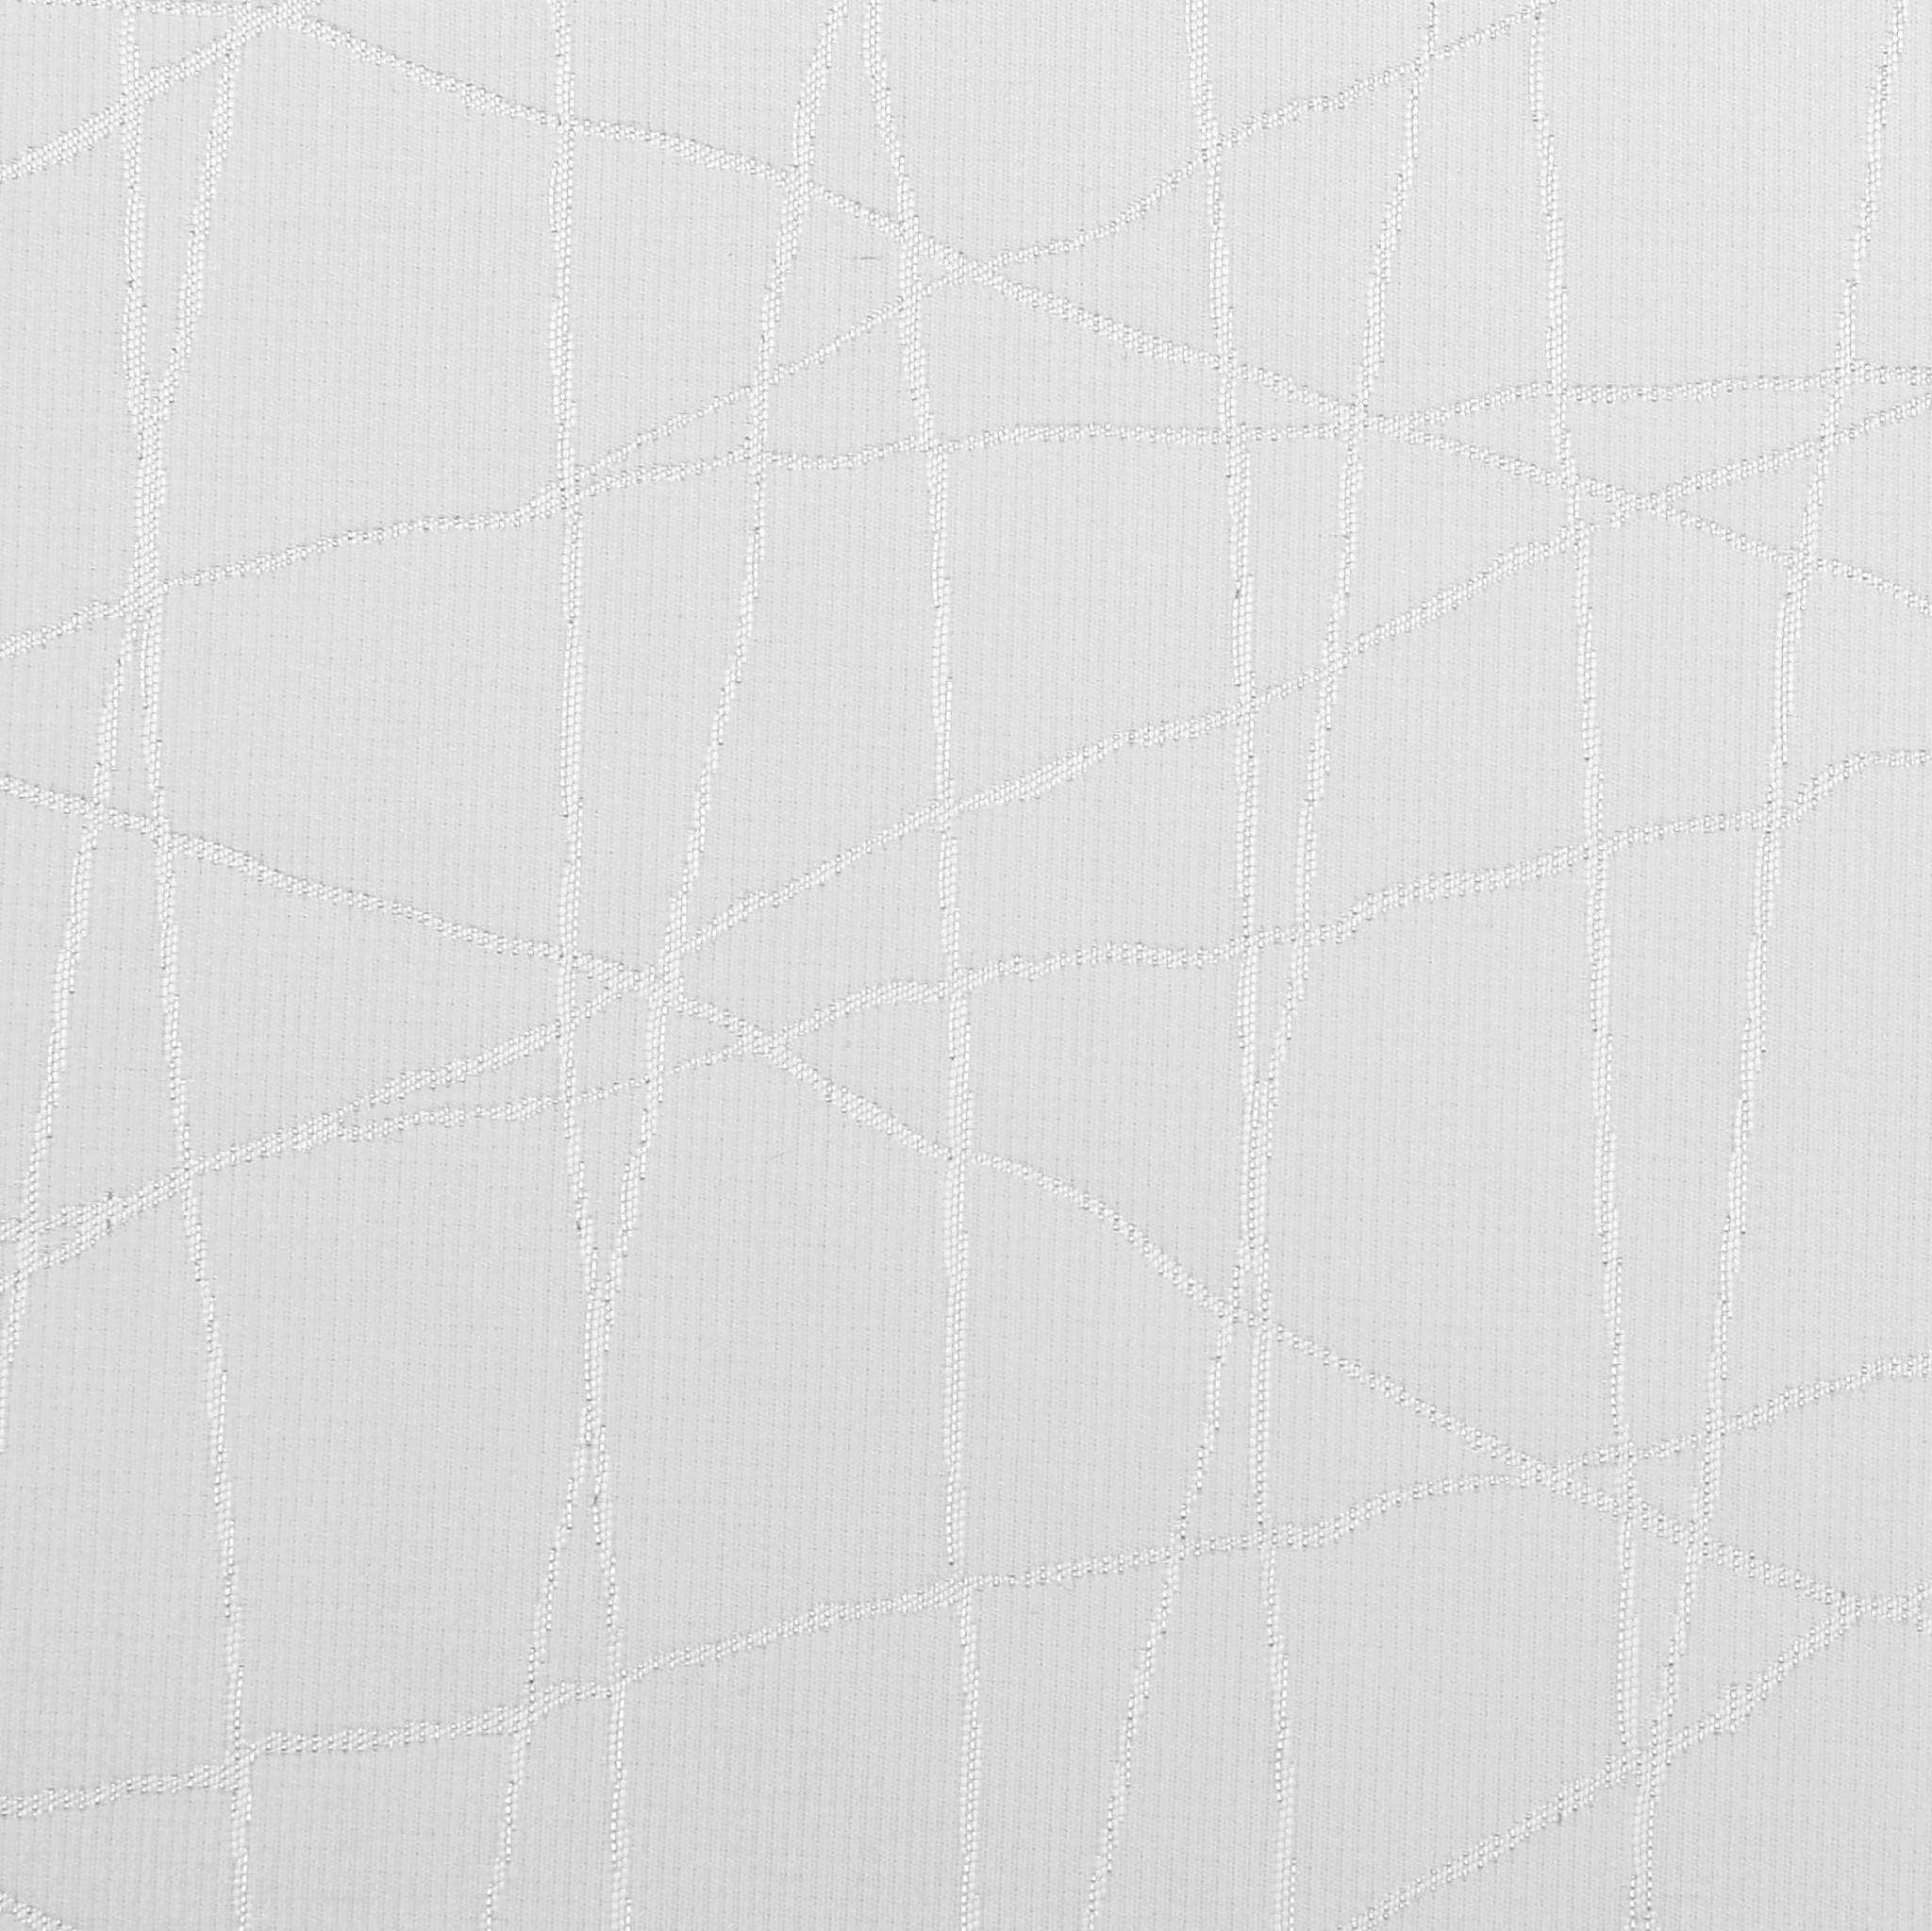 TC1333- 70 x 160 Jacquard White Silver Rays Tablecloth